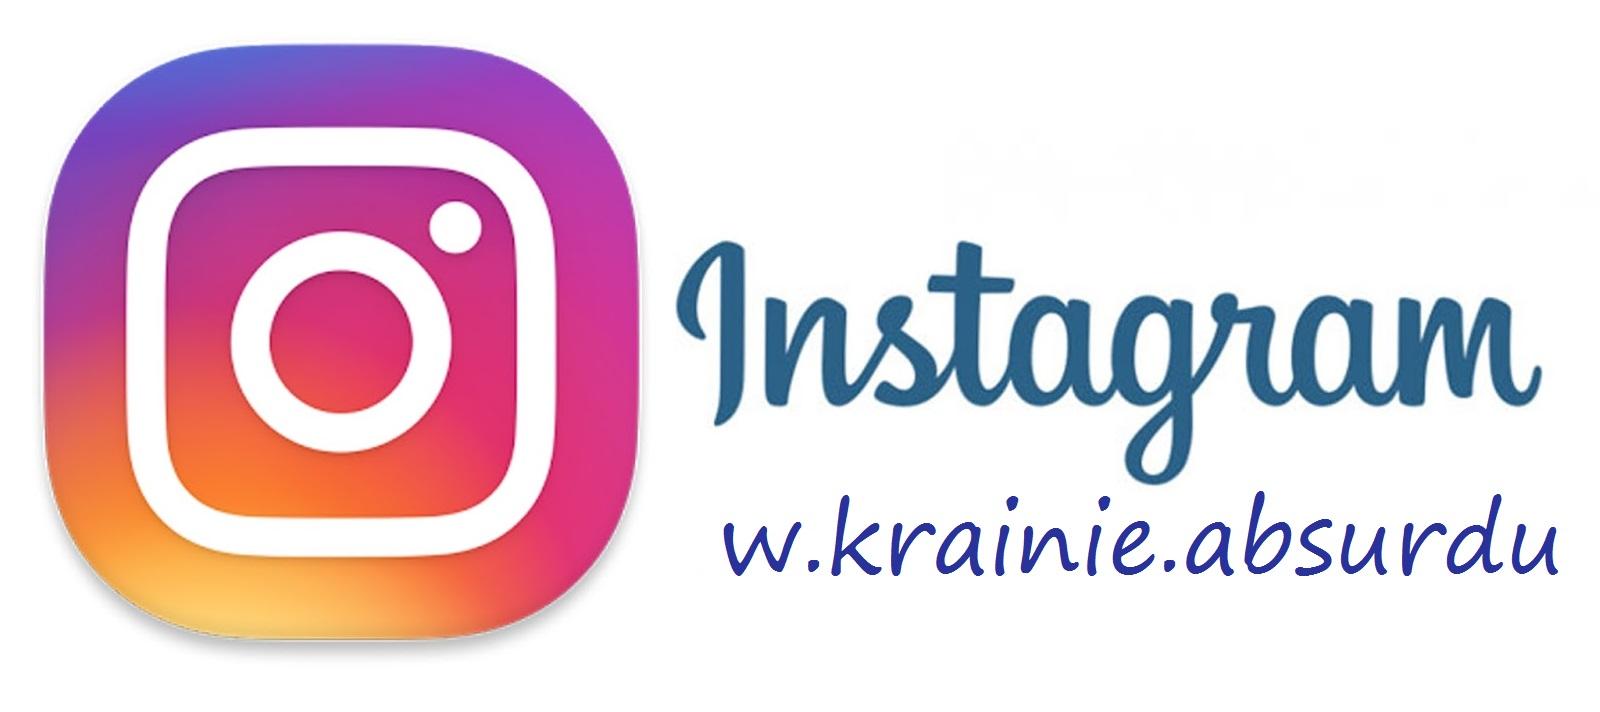 Blog na instagramie: